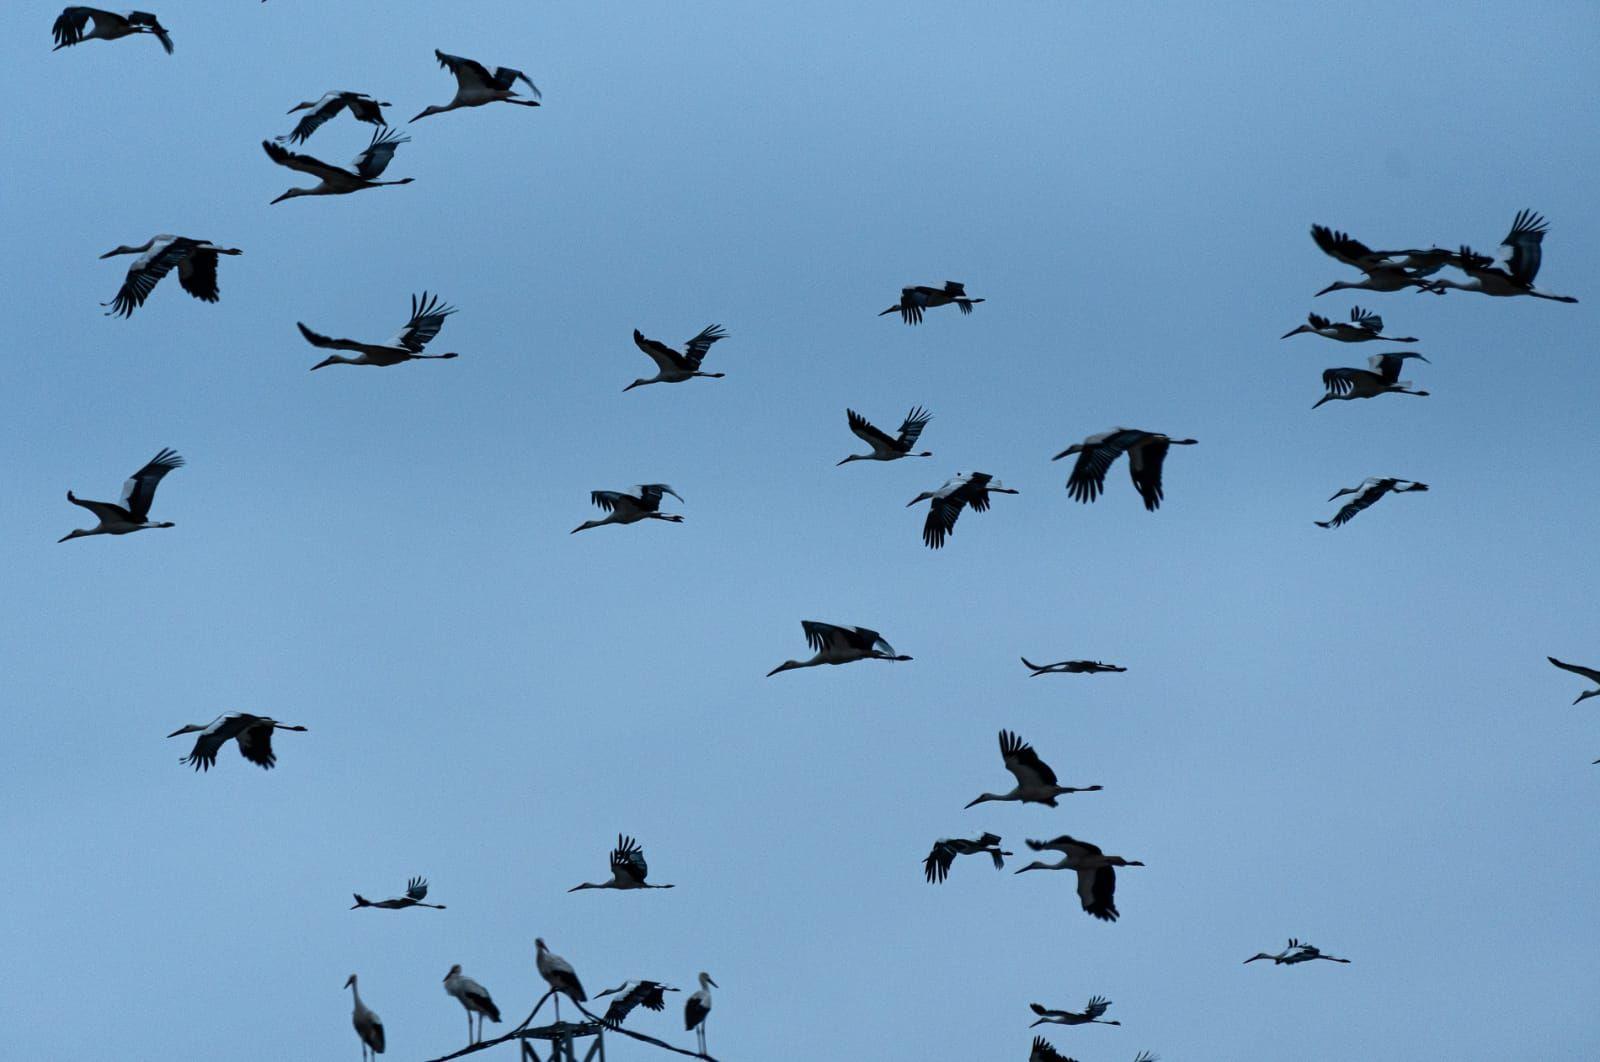 Un grup de cigonyes a Navàs